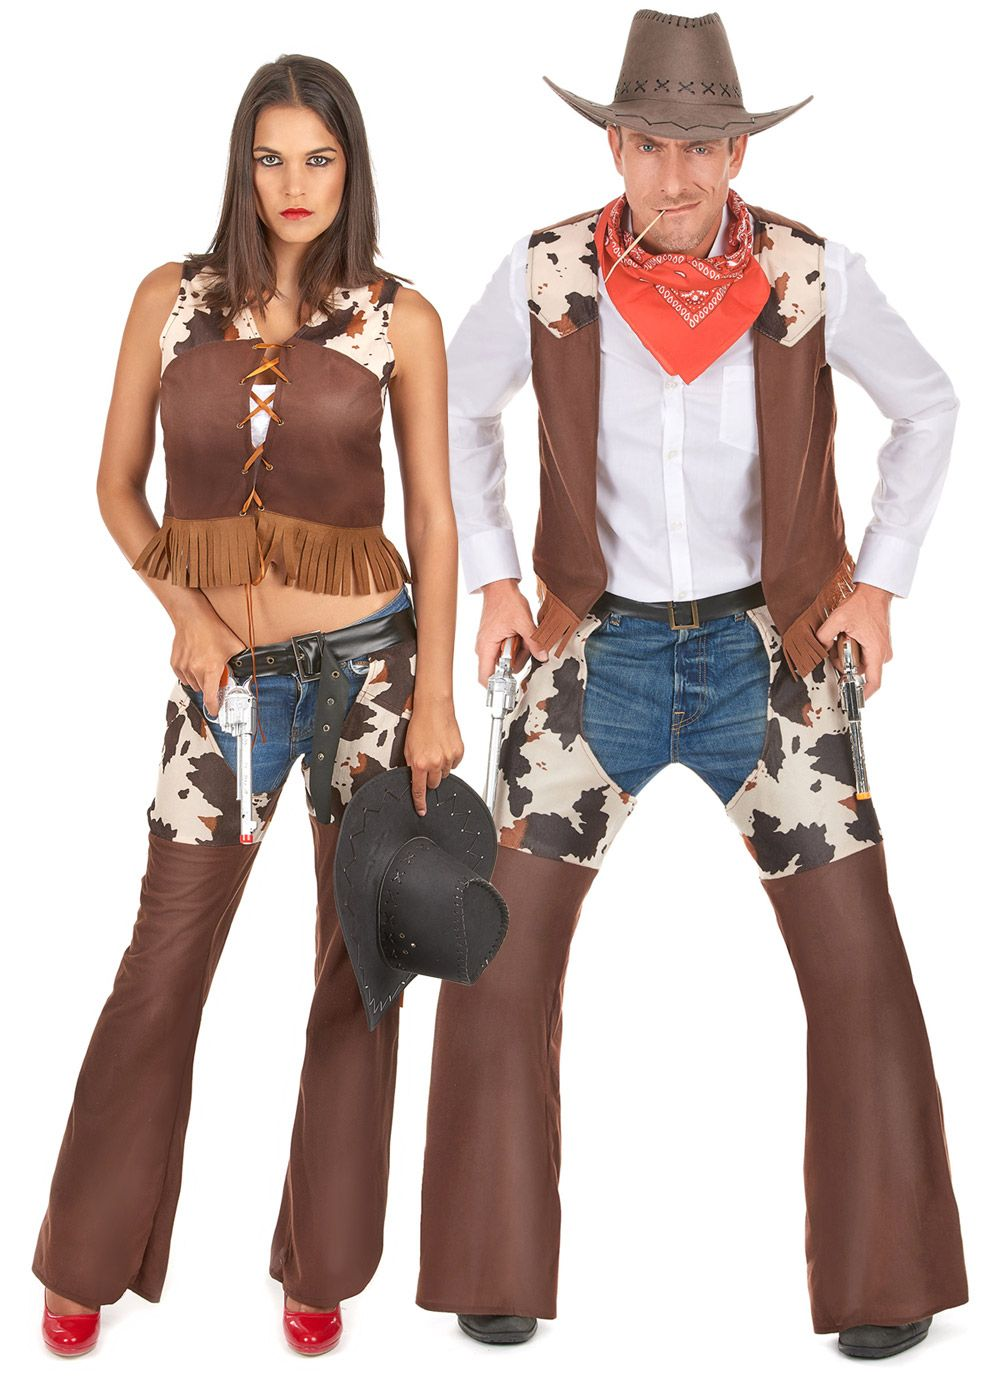 Disfraz de pareja cowboy adulto  Disfraz de cowboy hombreEste disfraz de  cowboy para hombre incluye chaleco y cubre pantalón (sombrero 10f8ad5b9d0